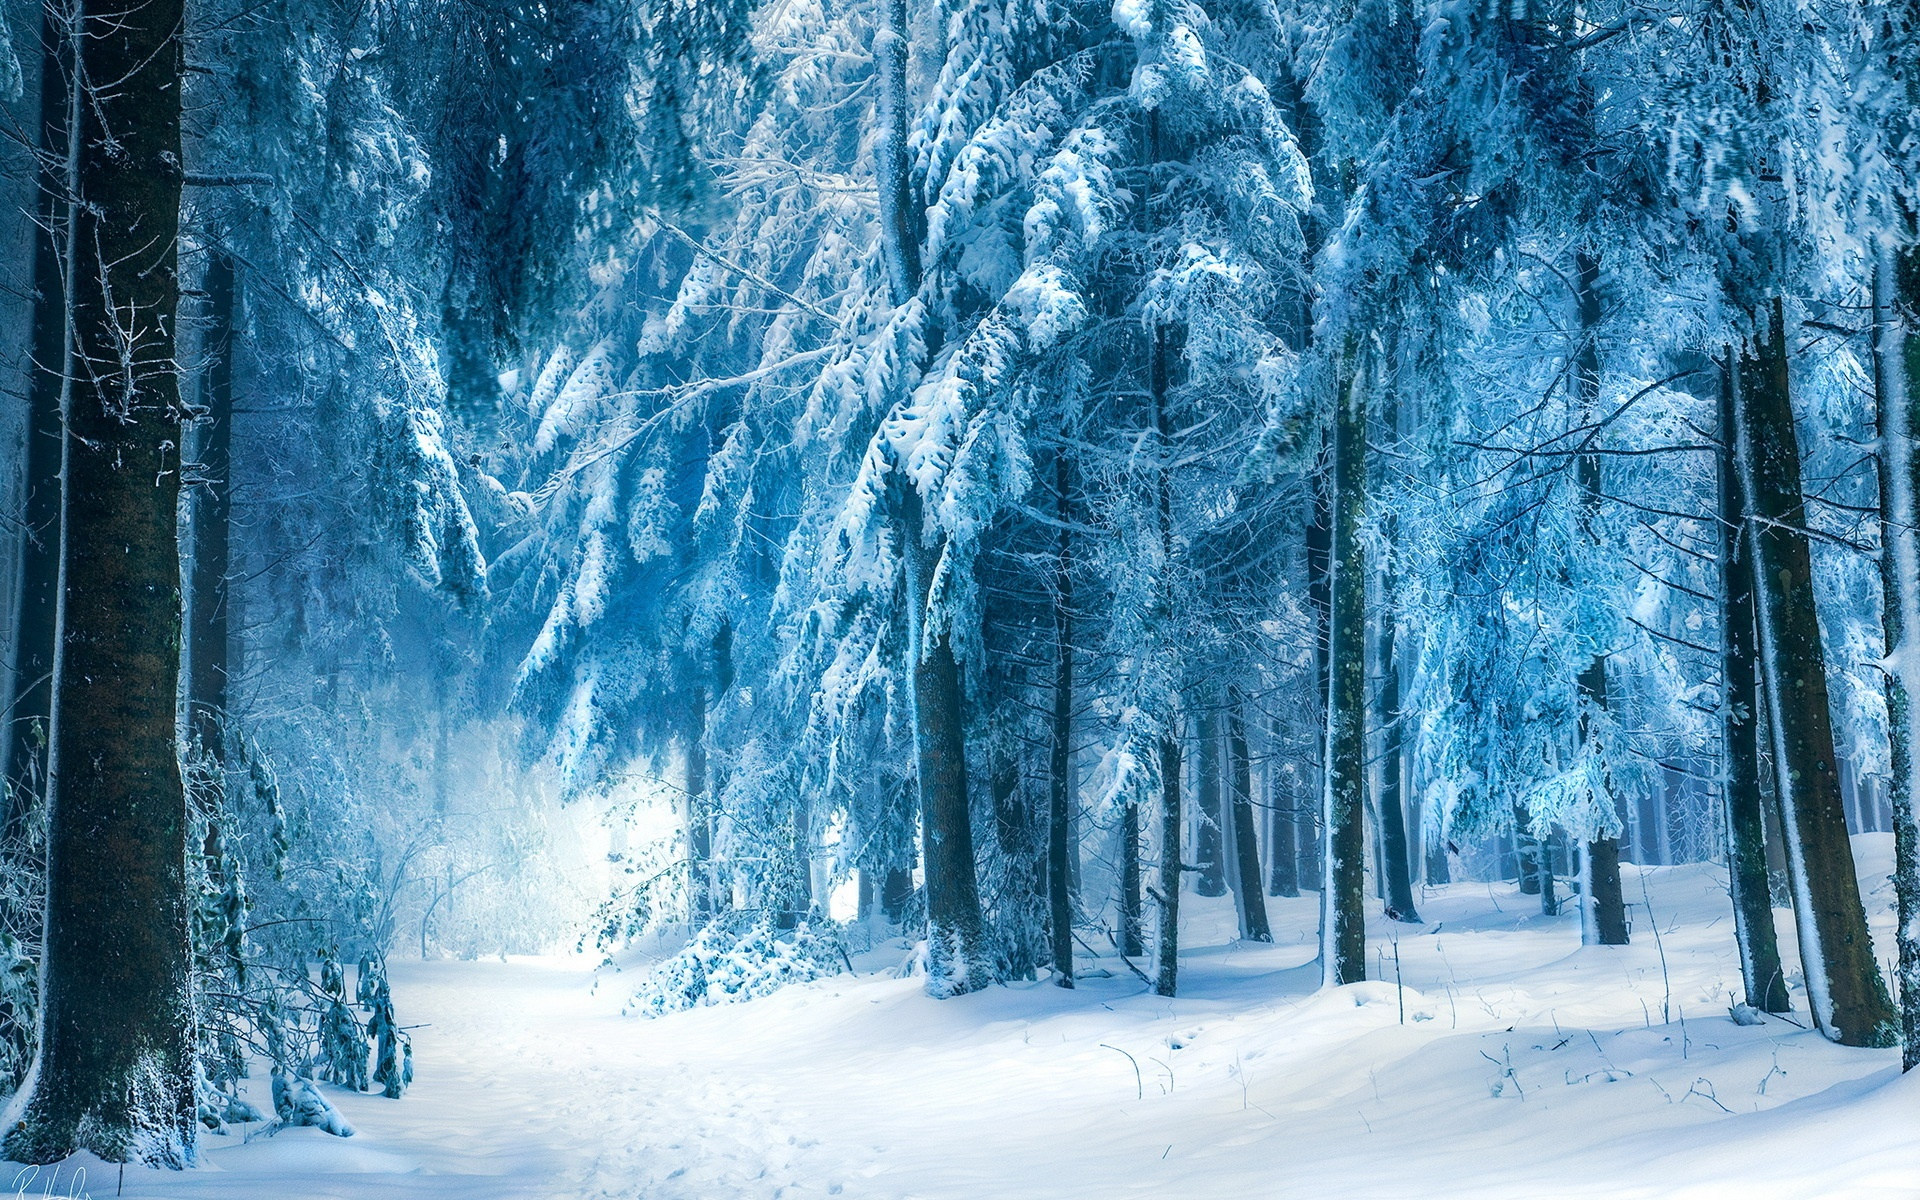 Wallpaper Winter Landscape Snow Forest 1920x1200 Hd Picture